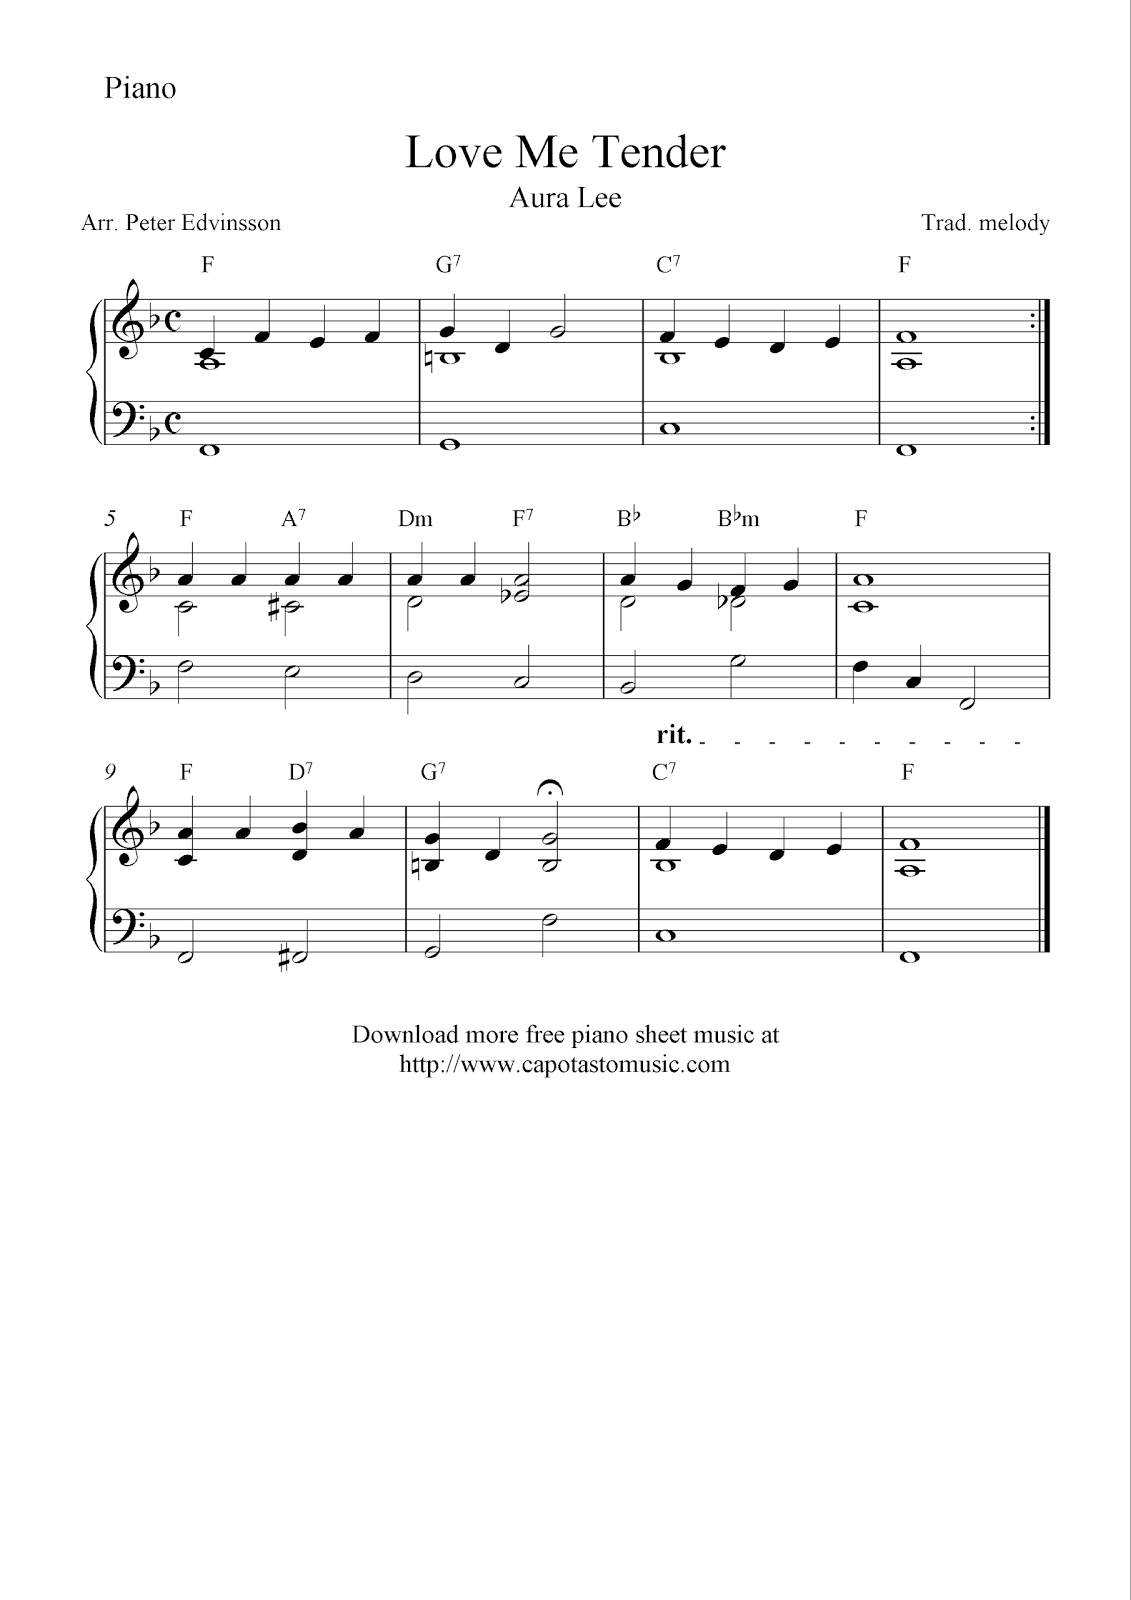 Free sheet music scores free easy piano sheet music love me free sheet music scores free easy piano sheet music love me tender aura hexwebz Images